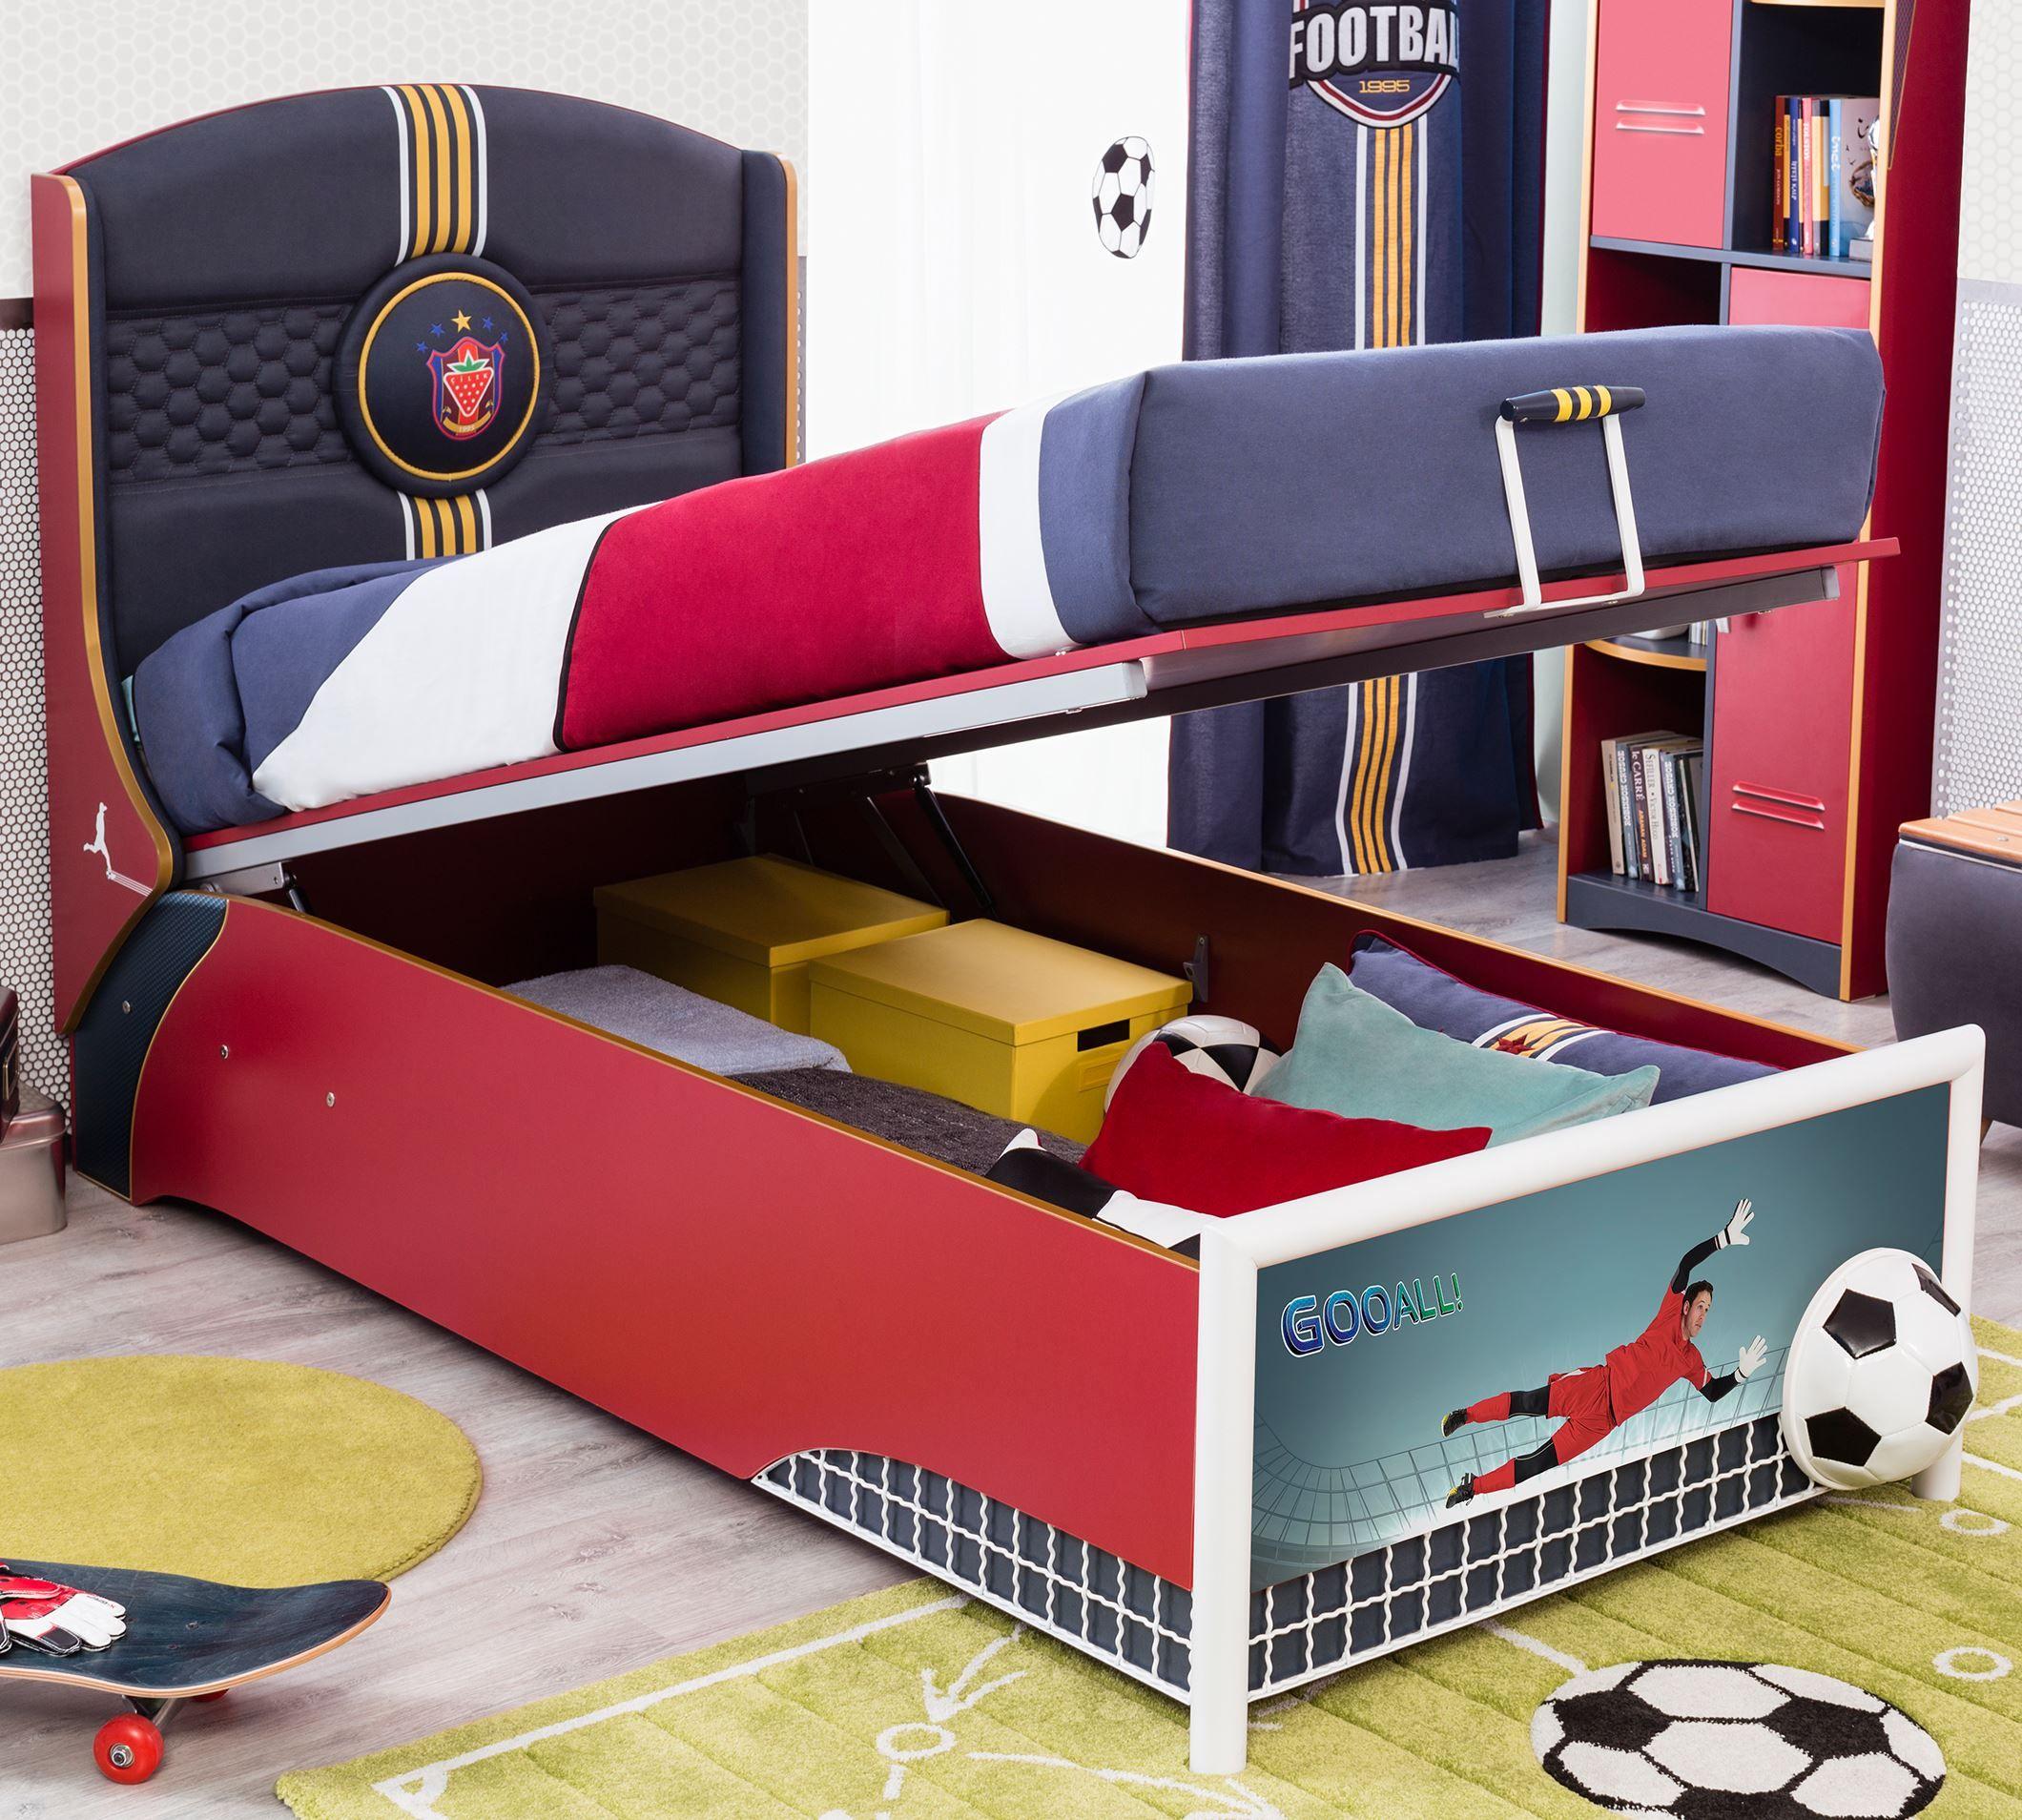 Cilek Football Bett Mit Bettkasten Kostenloser Versand Innerhalb